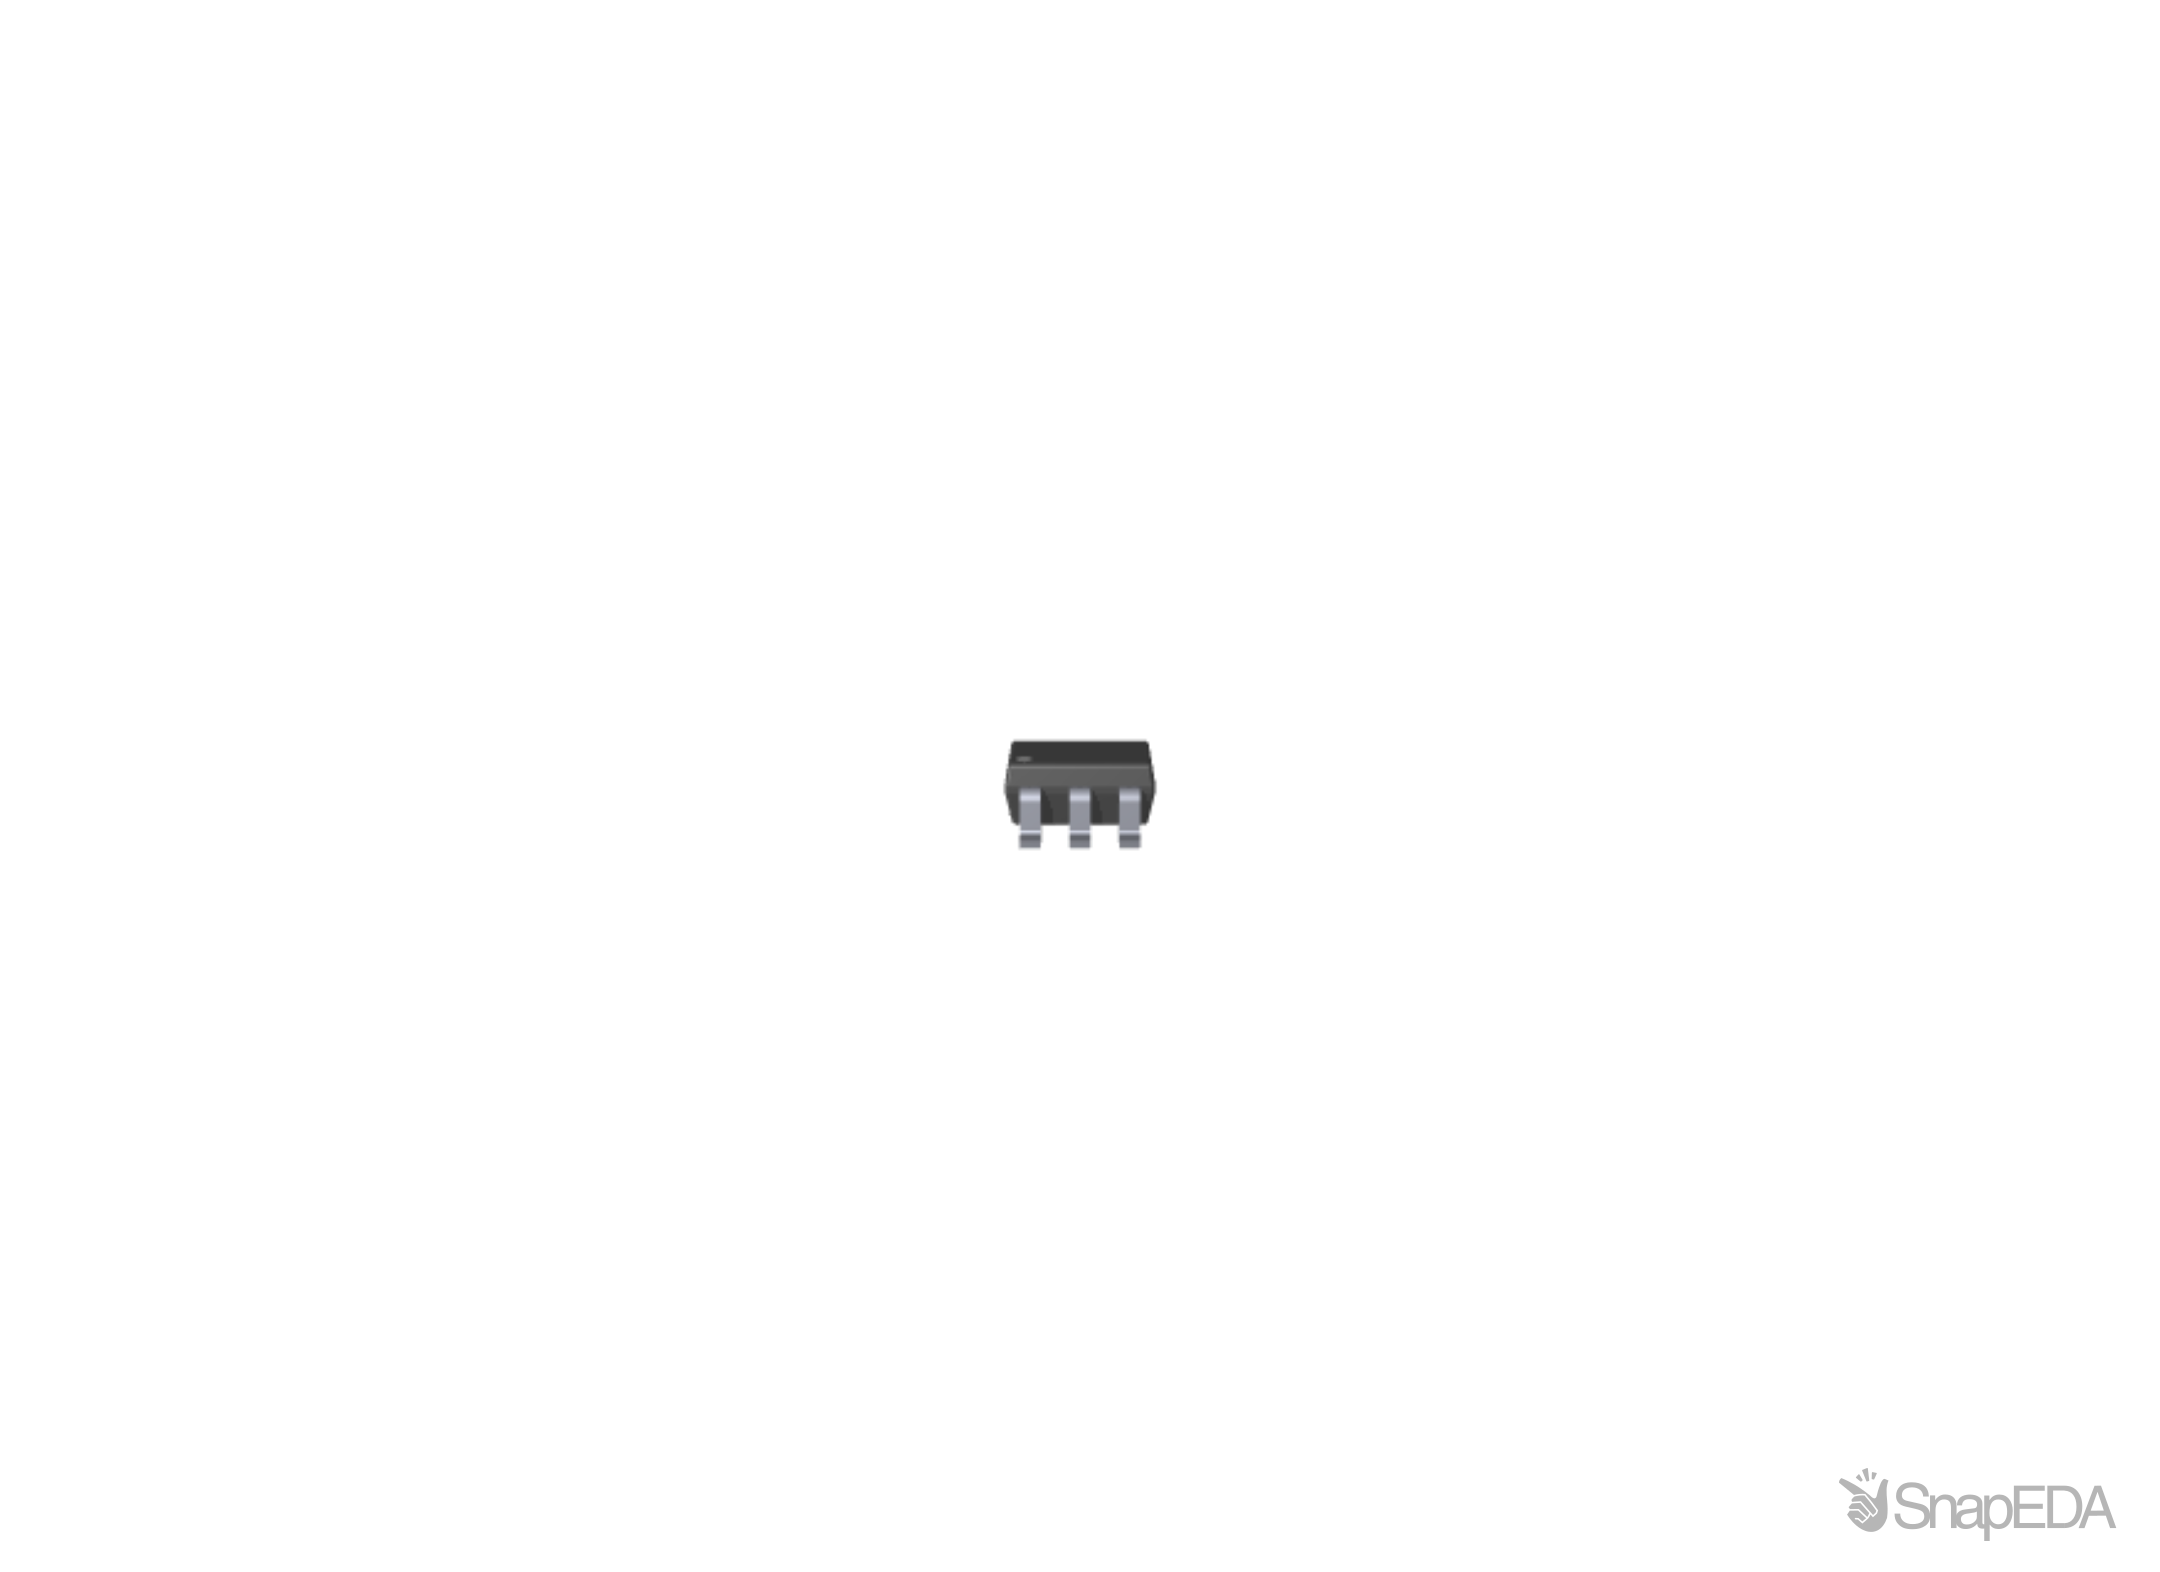 SN74LV1T34DBVR 3D Model